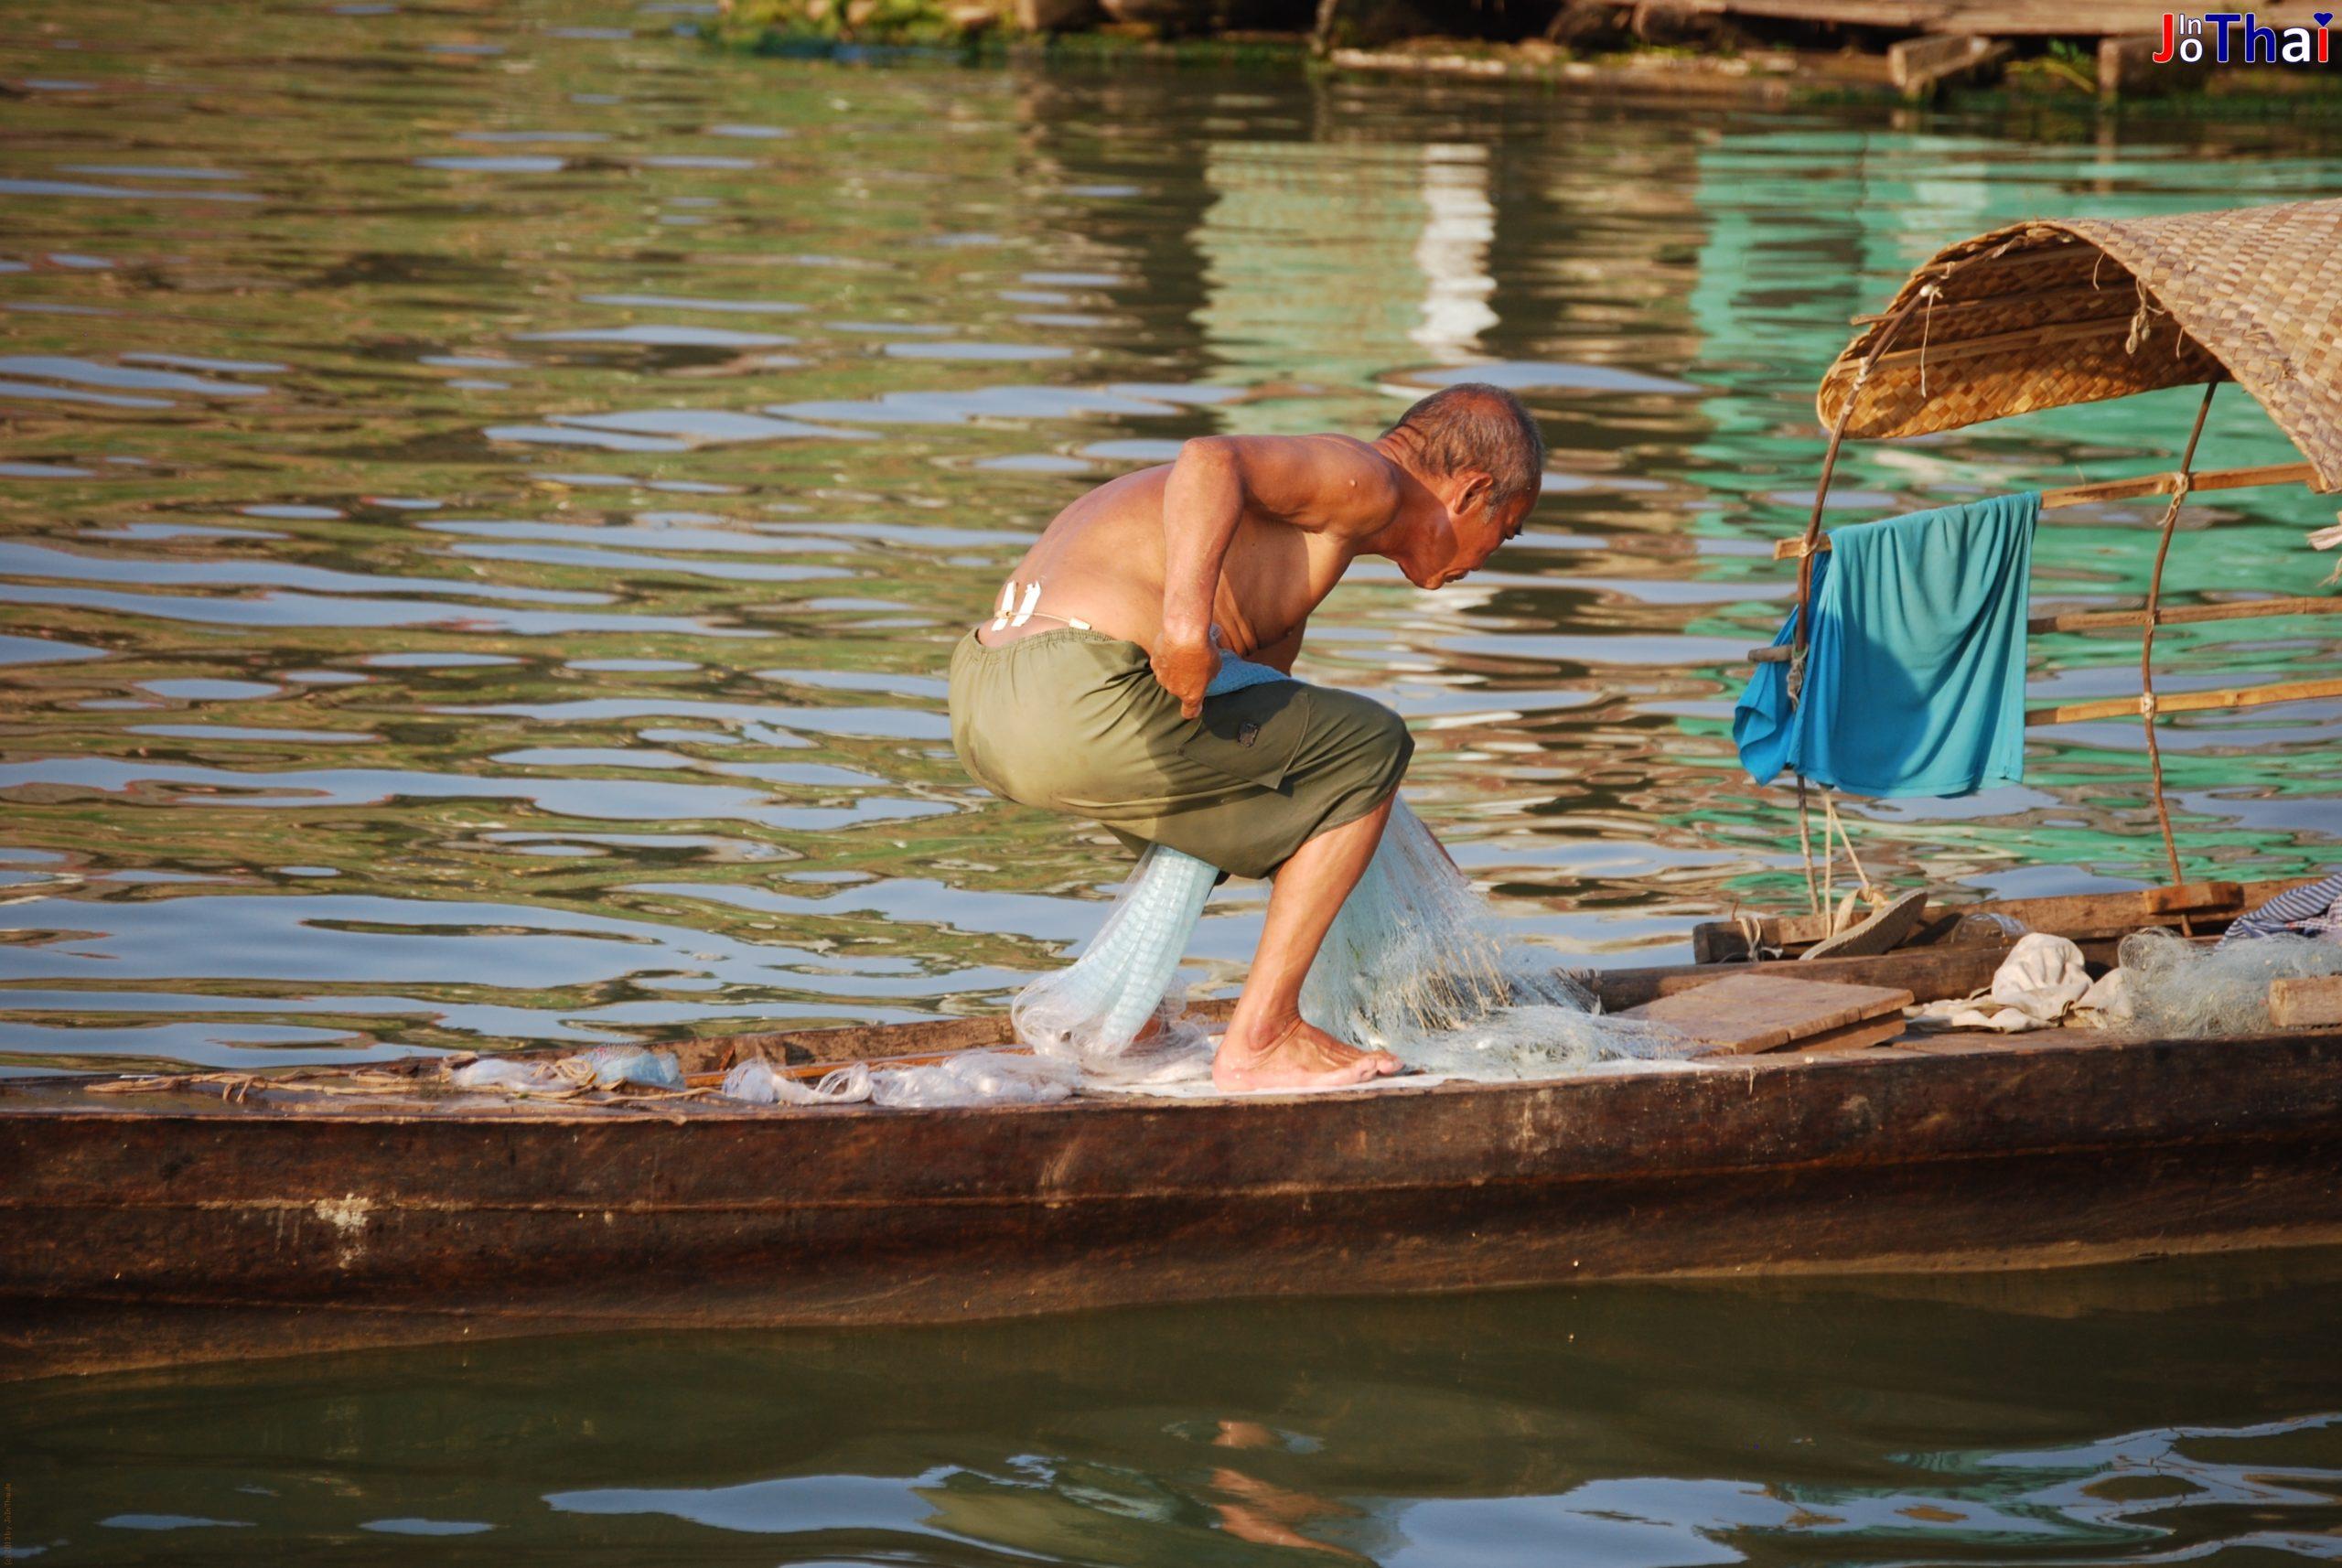 Fischer auf dem Tonle Sap in Phnom Penh - Cambodia